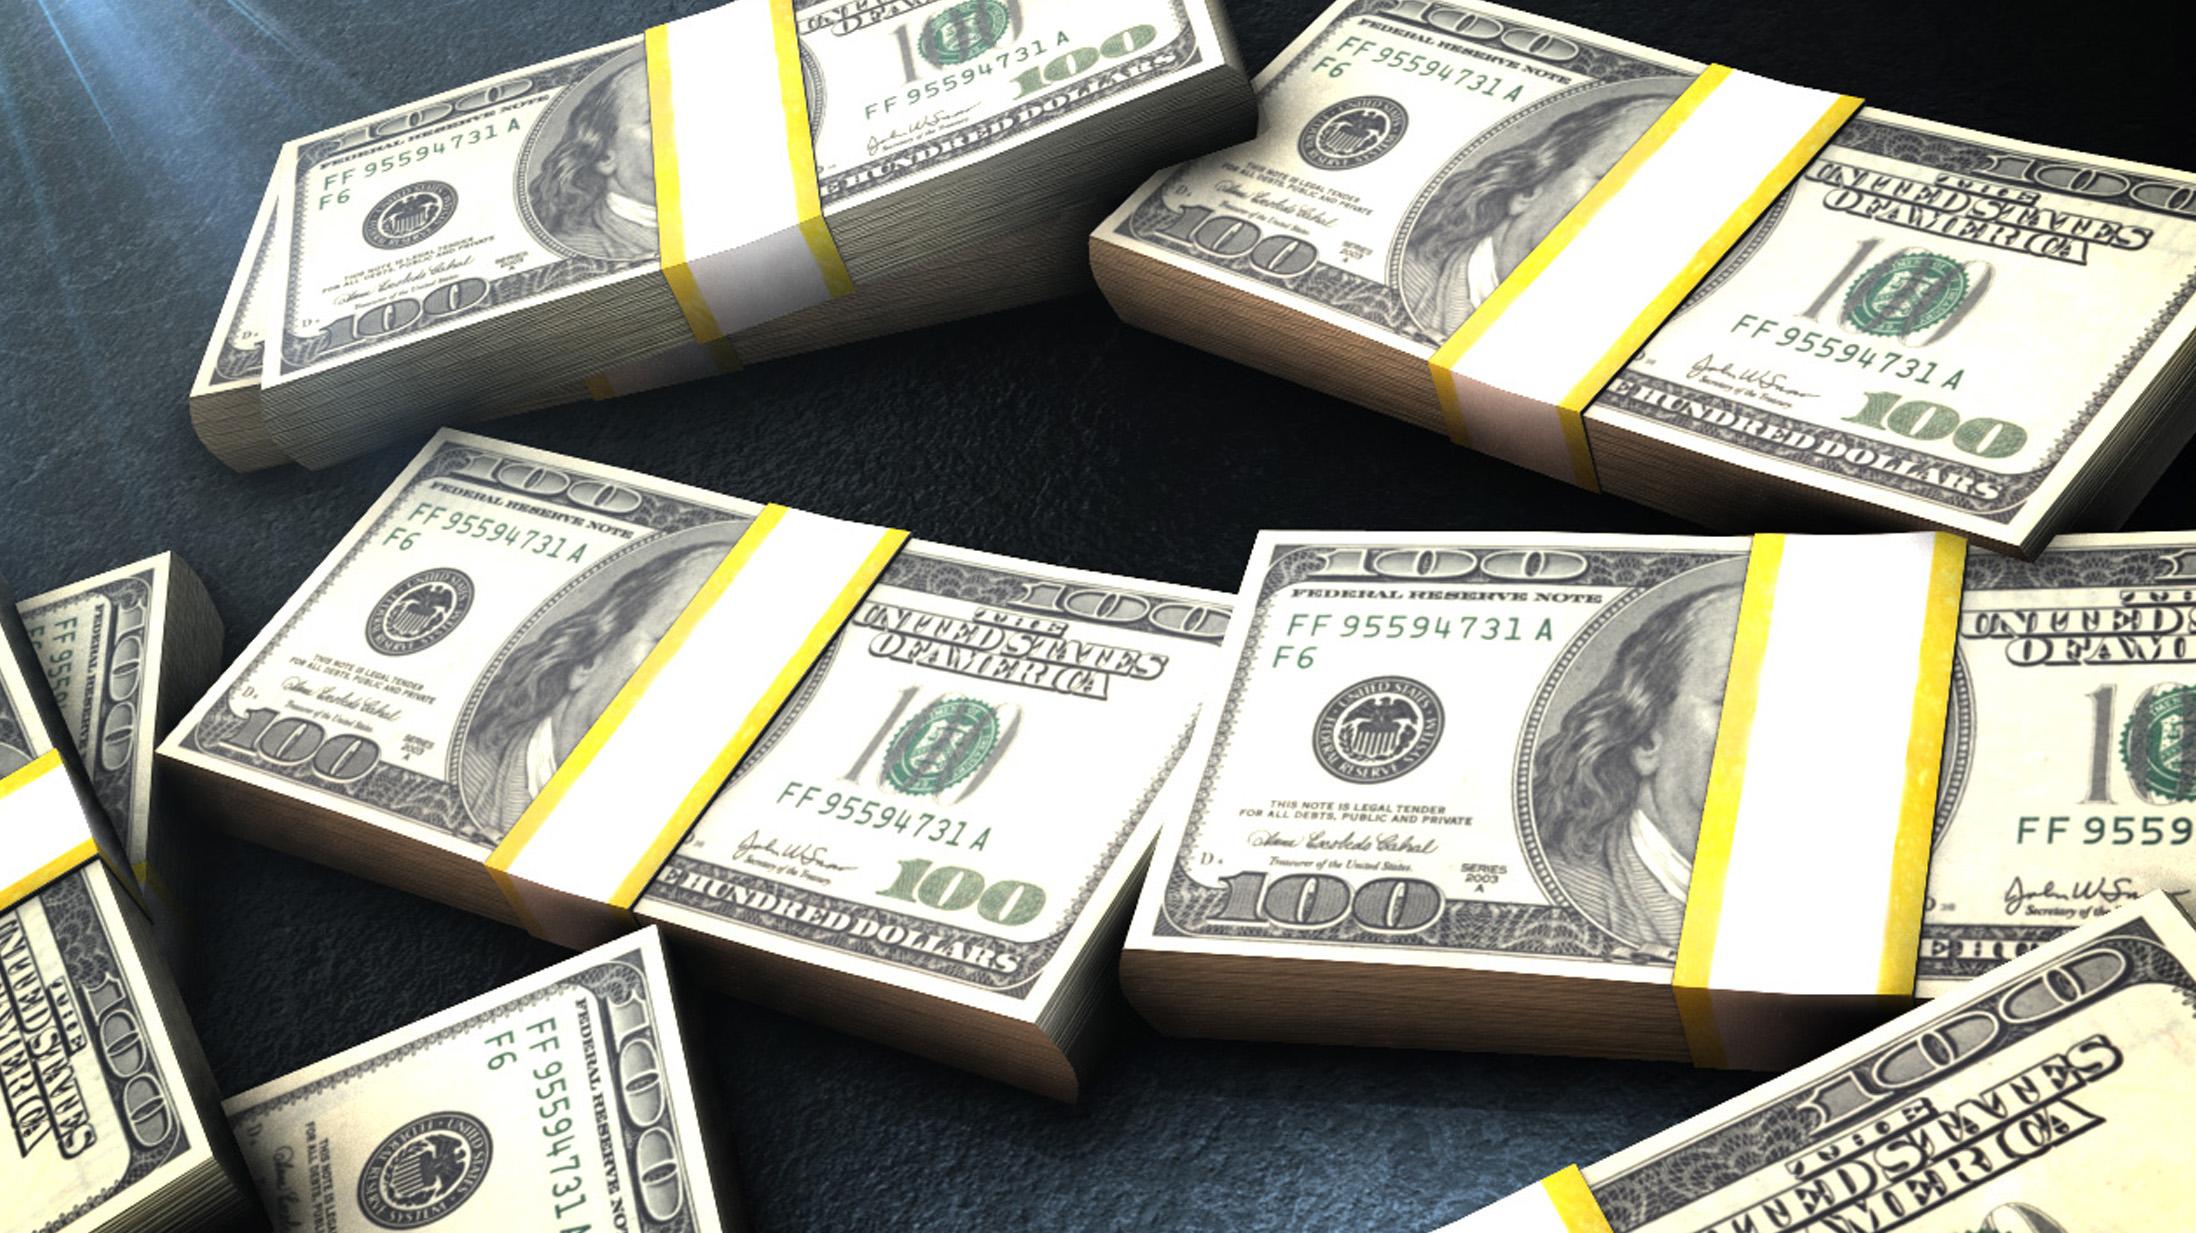 Money 10122015_1448258801586.jpg